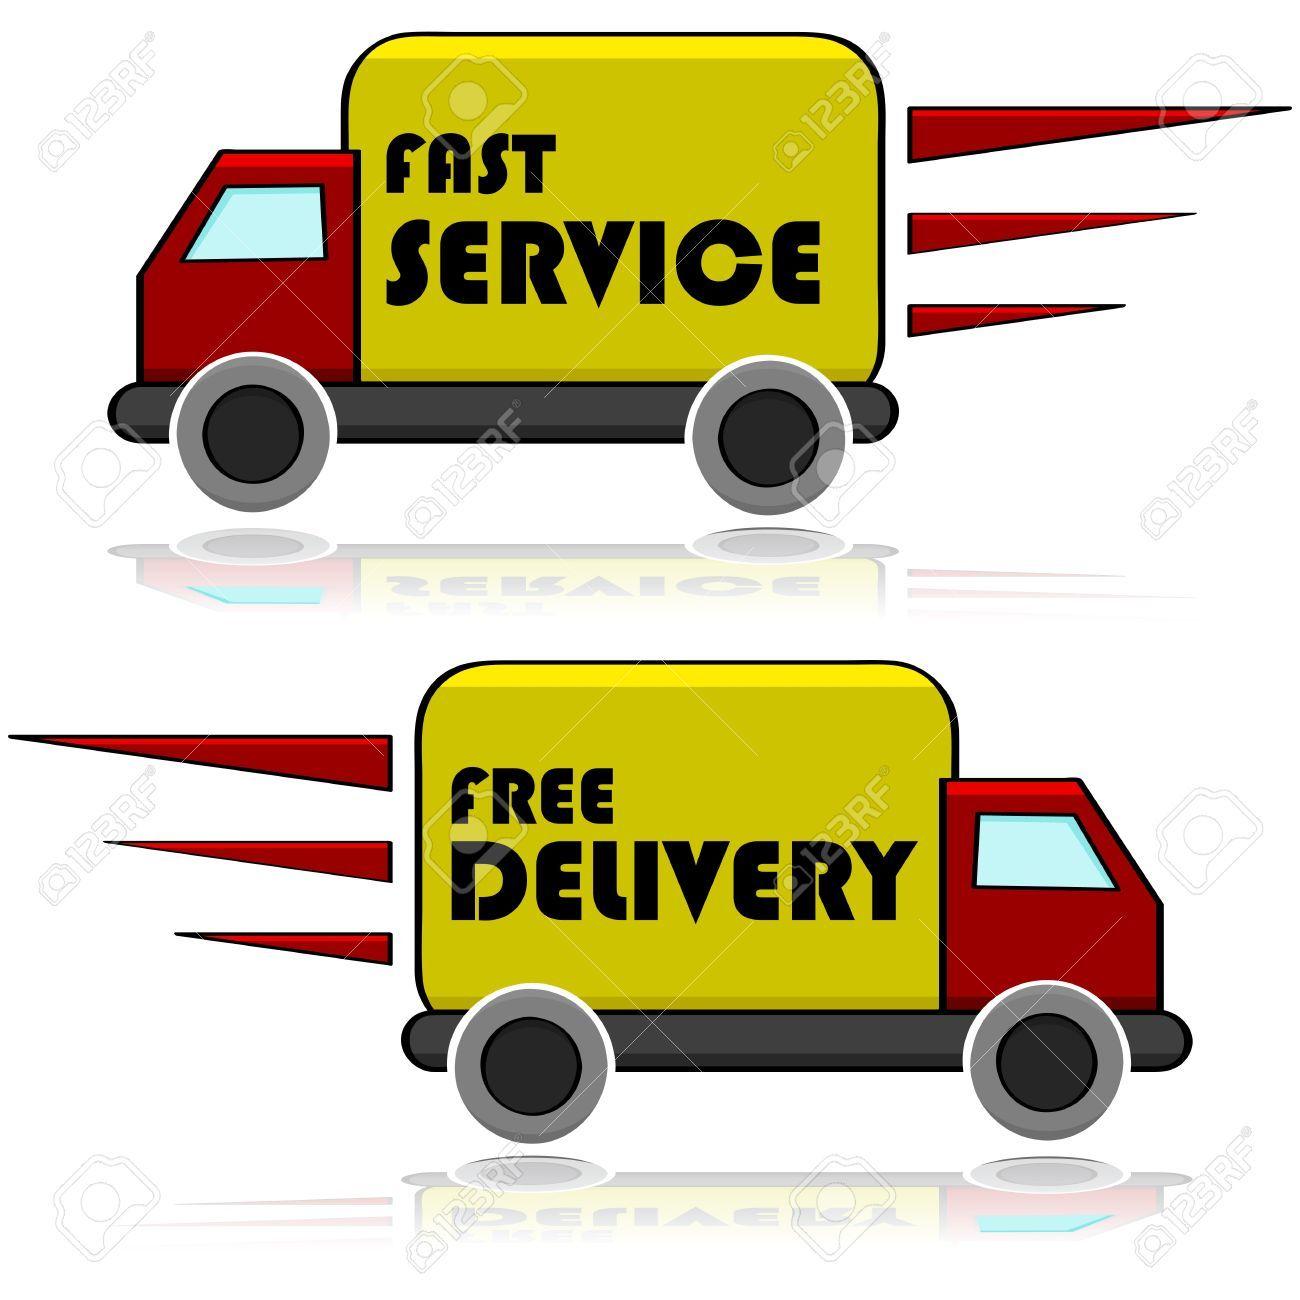 Fast truck clipart 4 » Clipart Portal.